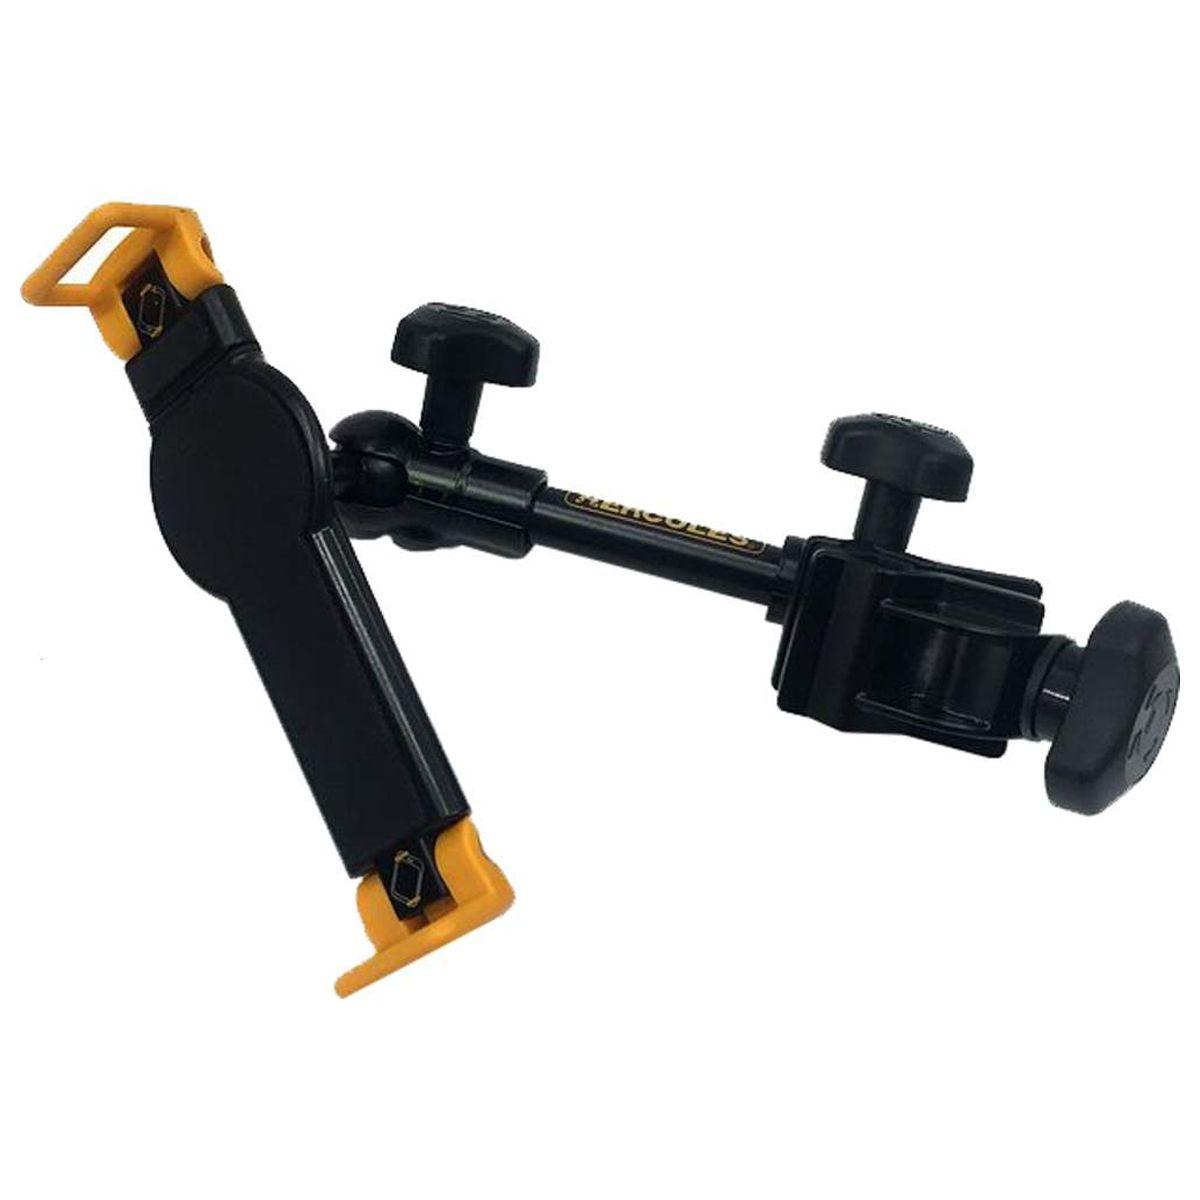 Suporte para Tablet de 7 a 10,1 polegadas Hercules DG300B